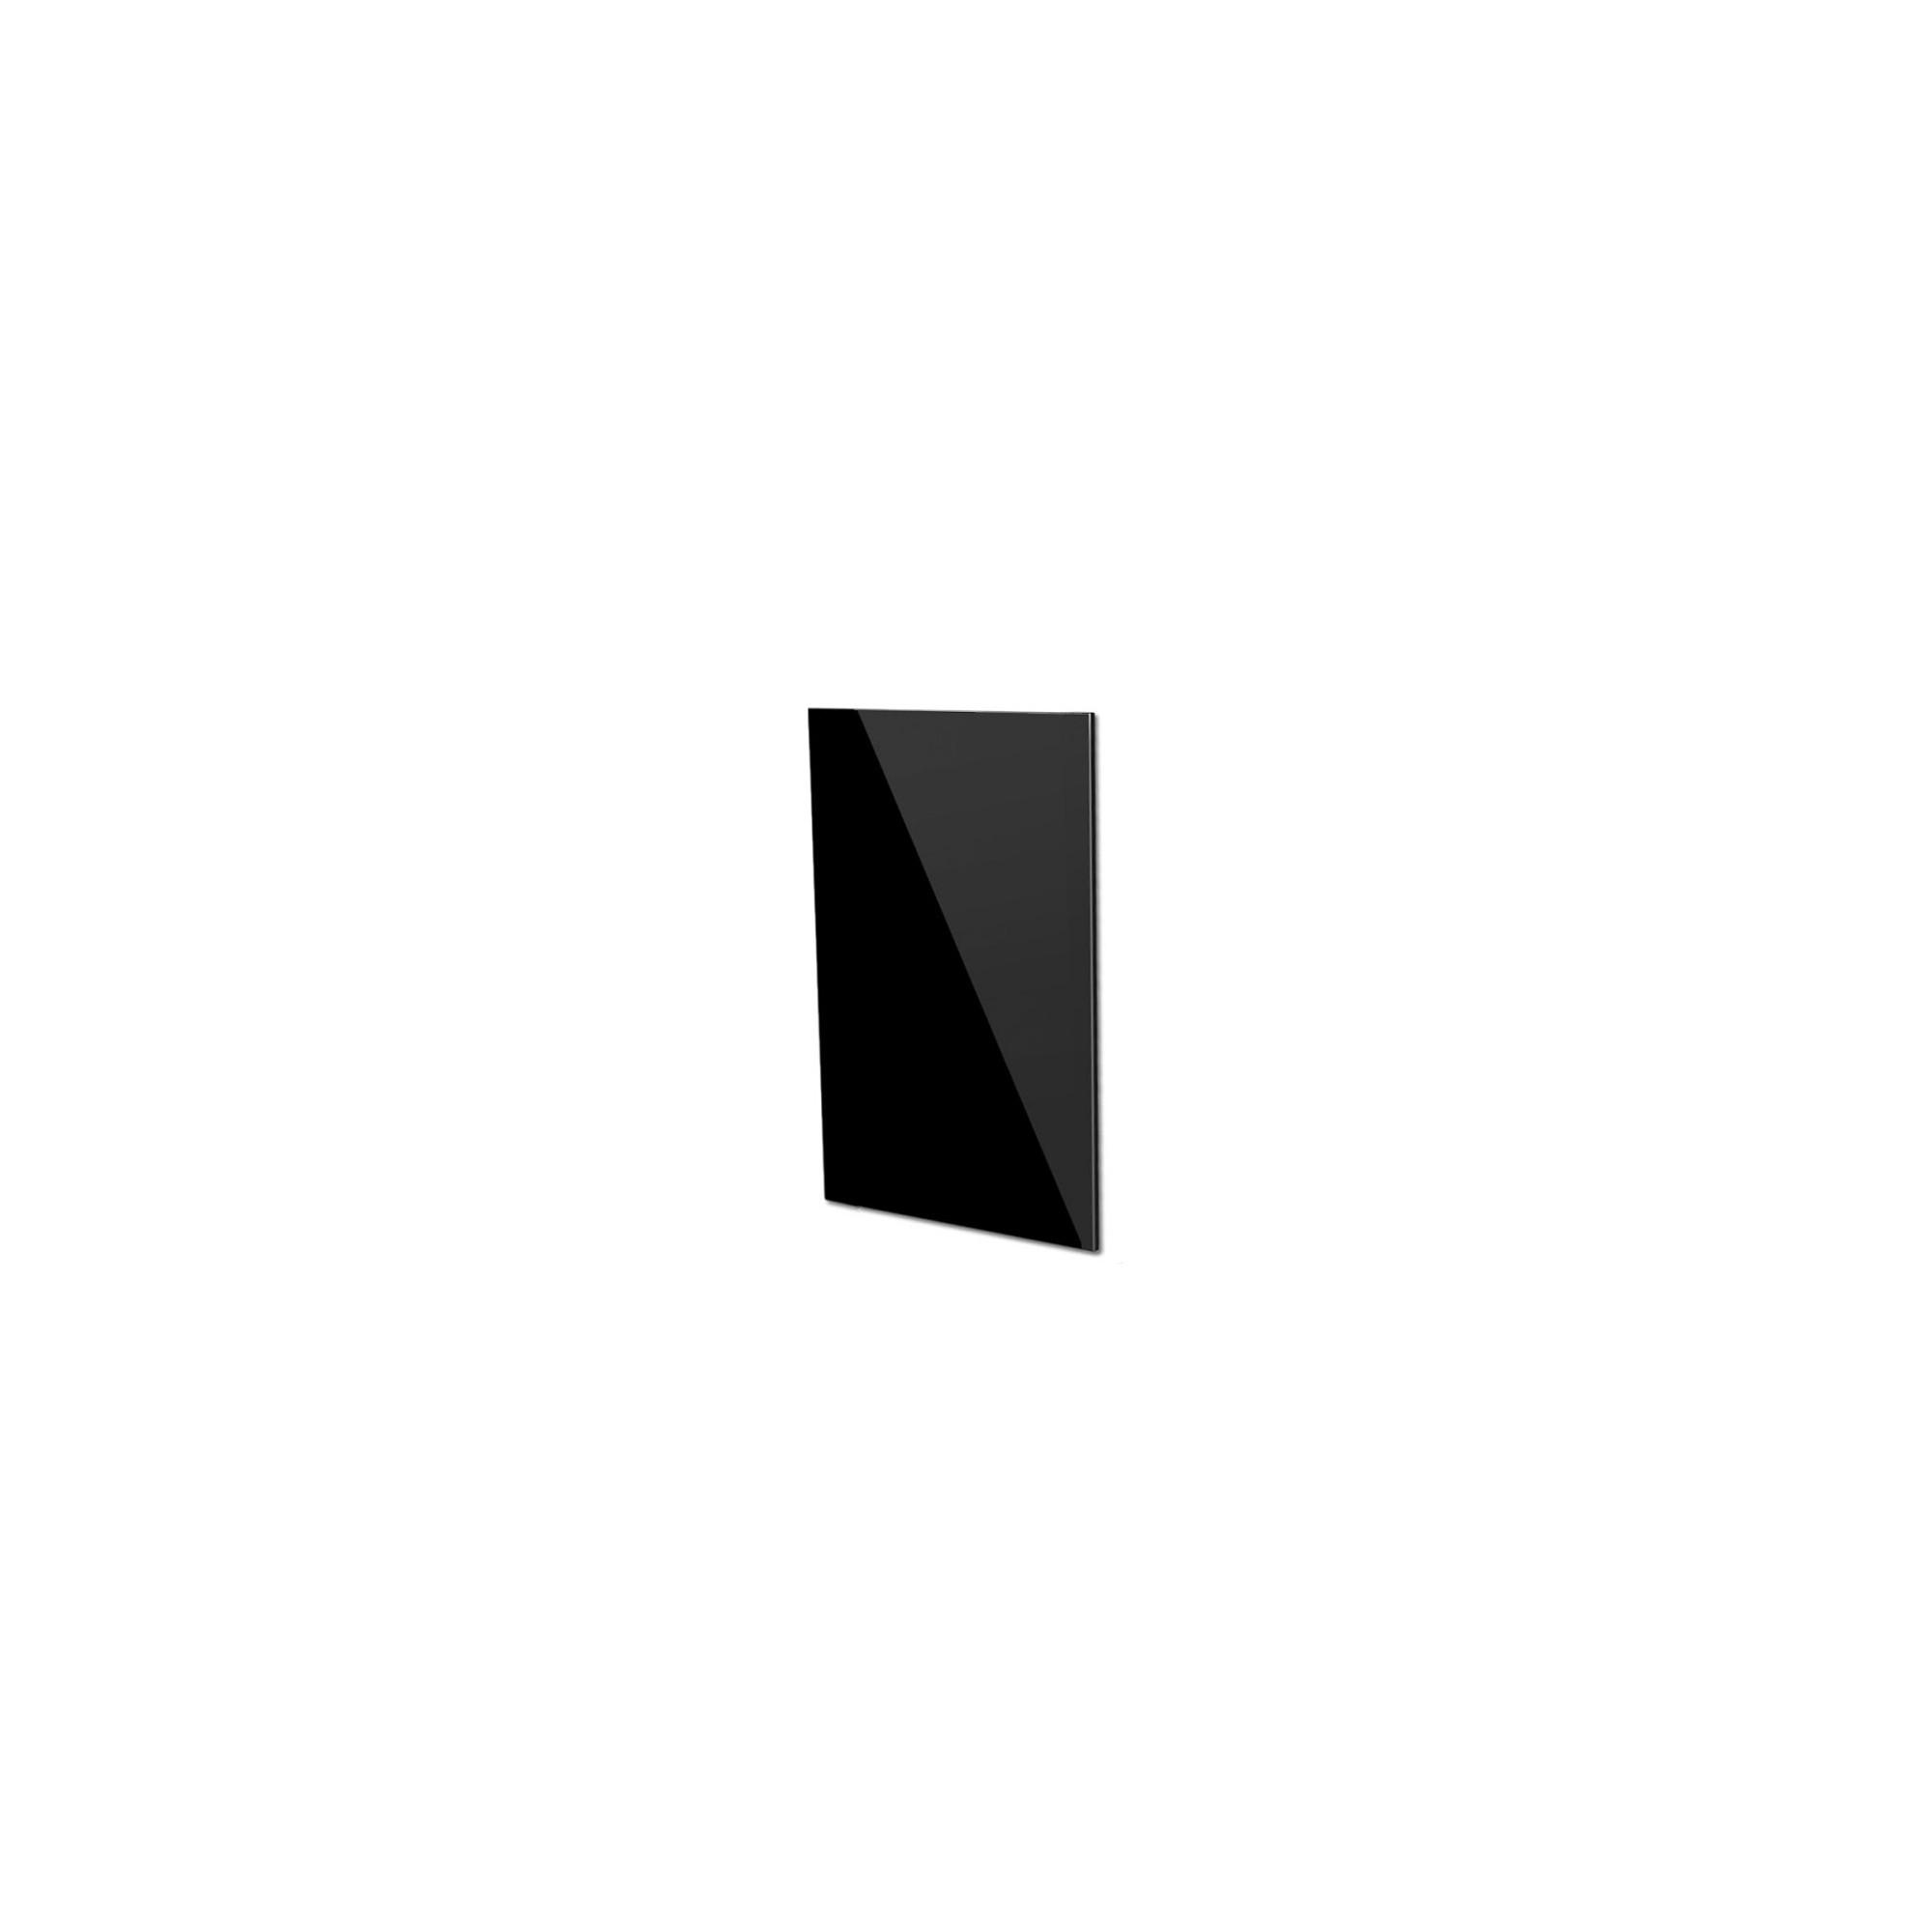 BLACK BACK GLASS KT85M (222X490 MM)